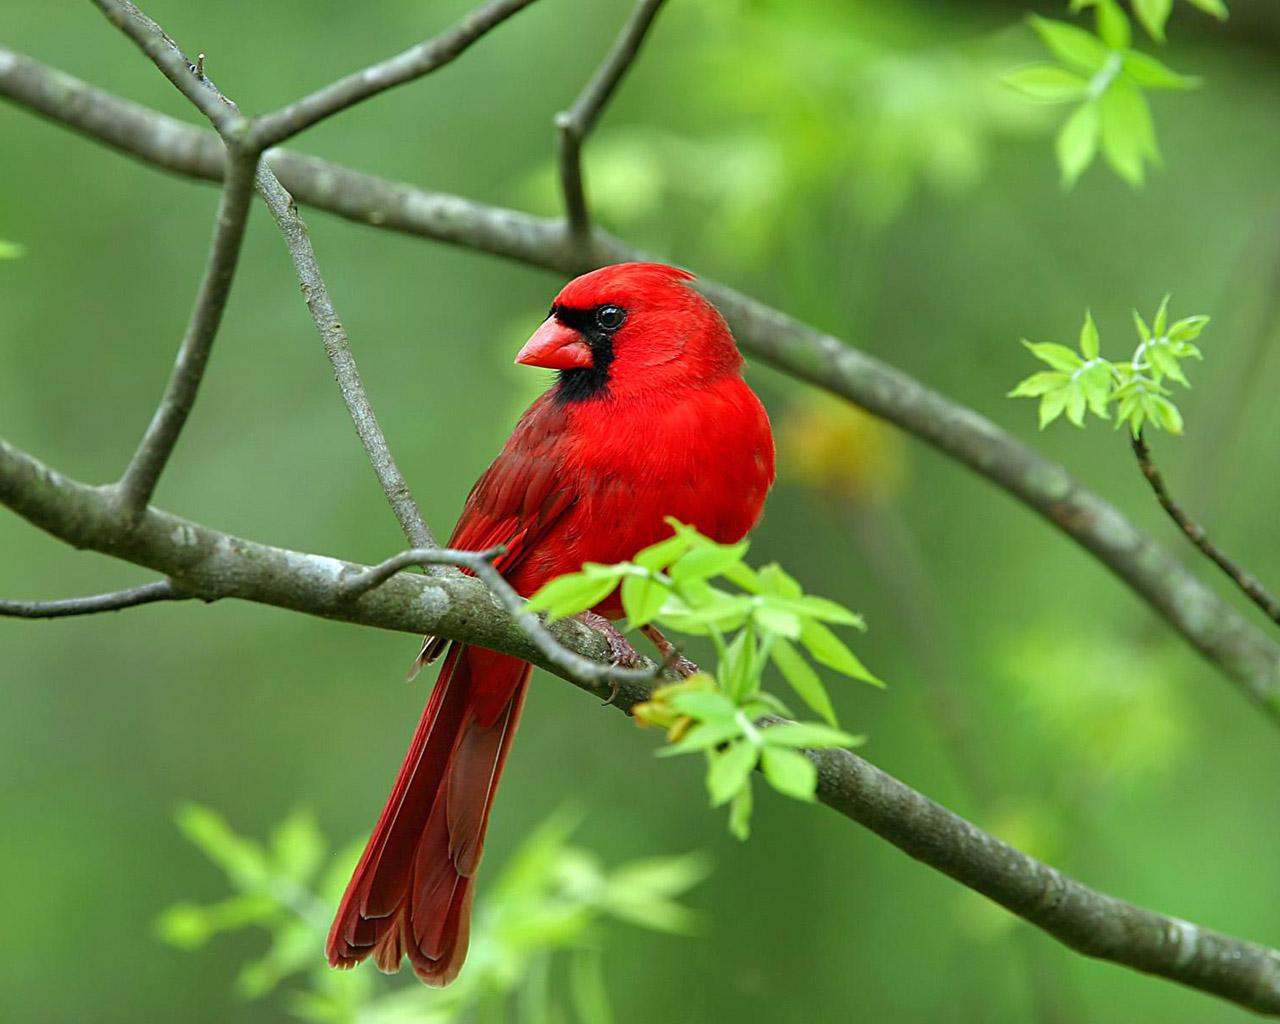 بالصور صور عصافير , صور رائع لعصافير مختلفة 3306 12